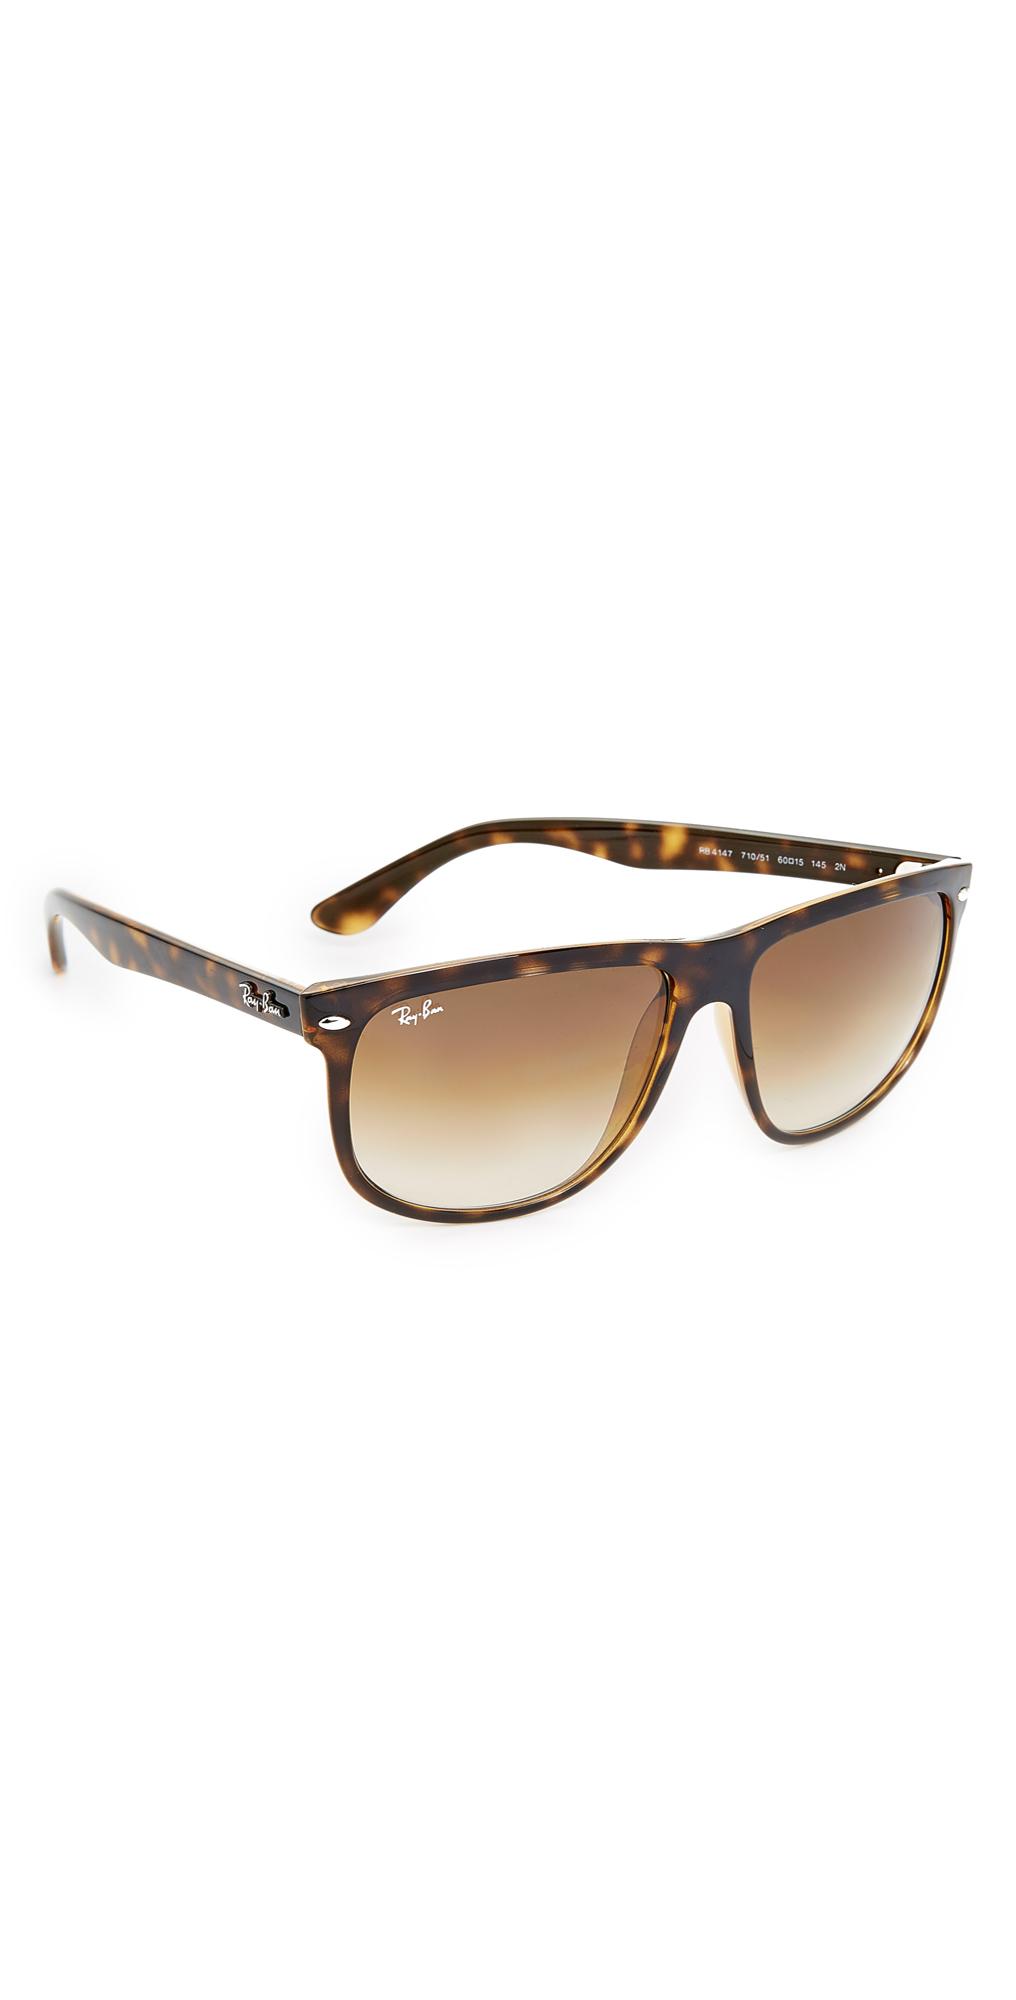 Boyfriend Sunglasses Ray-Ban